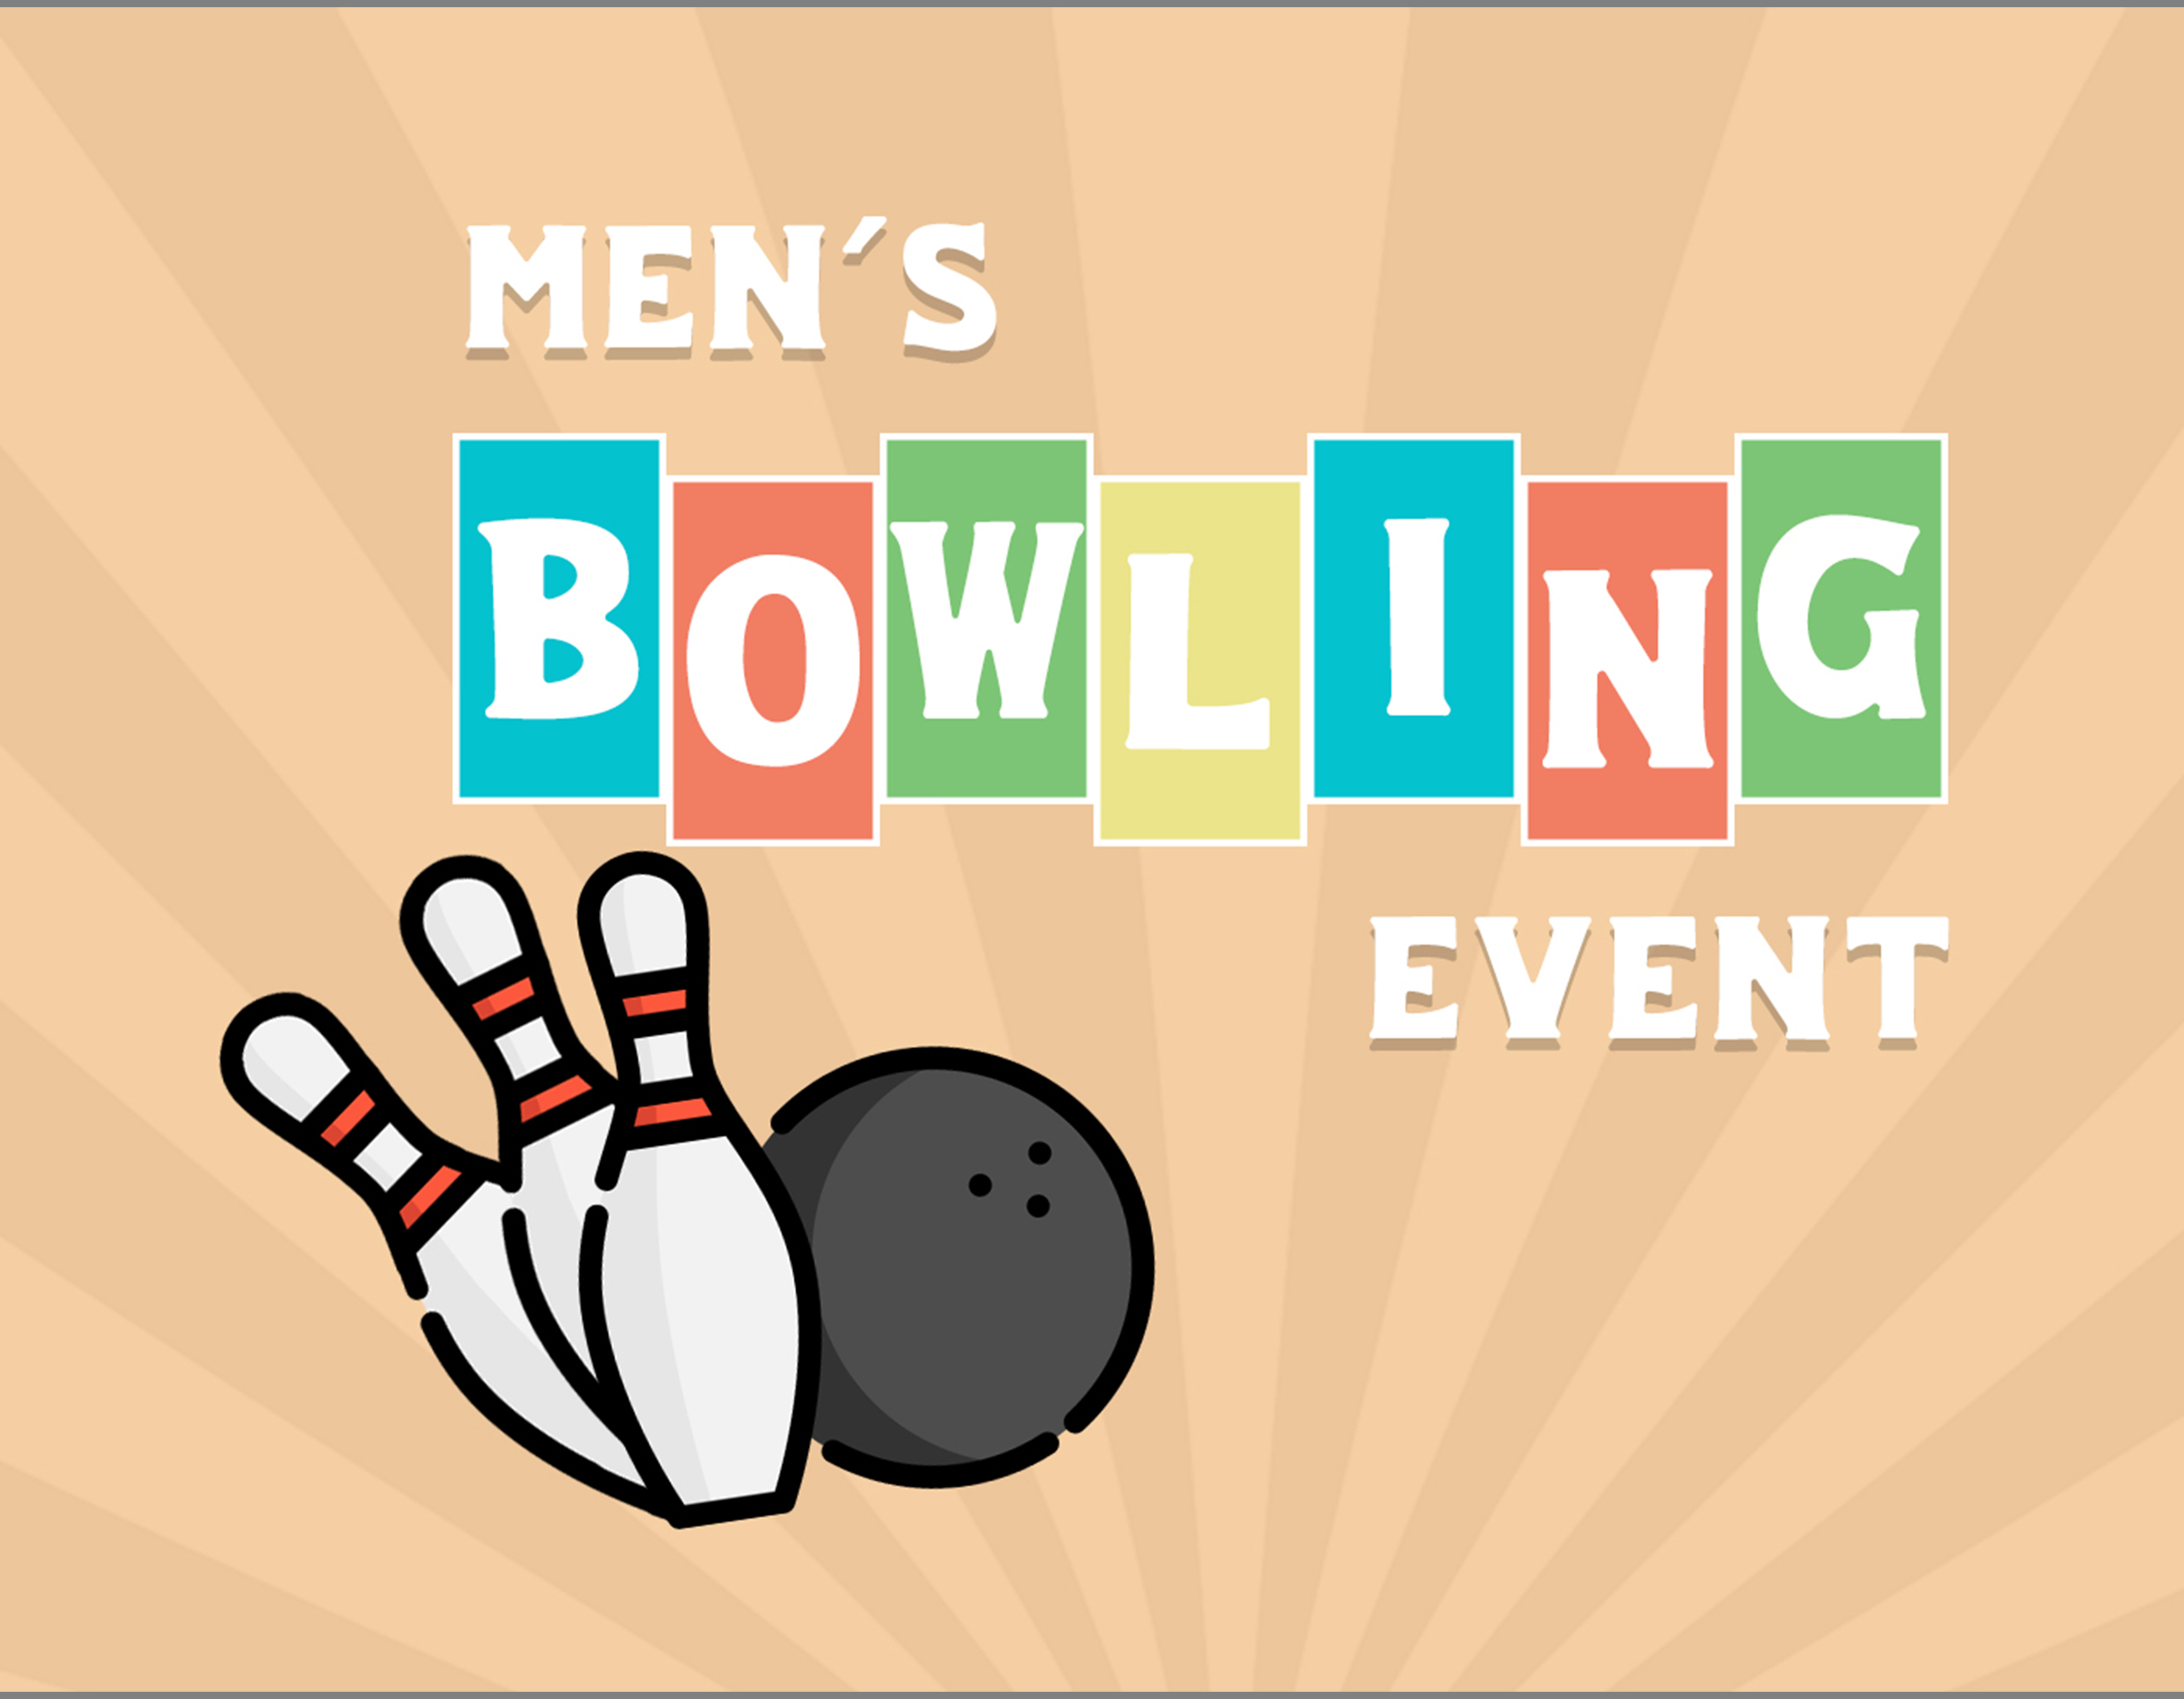 Men's Bowling Event